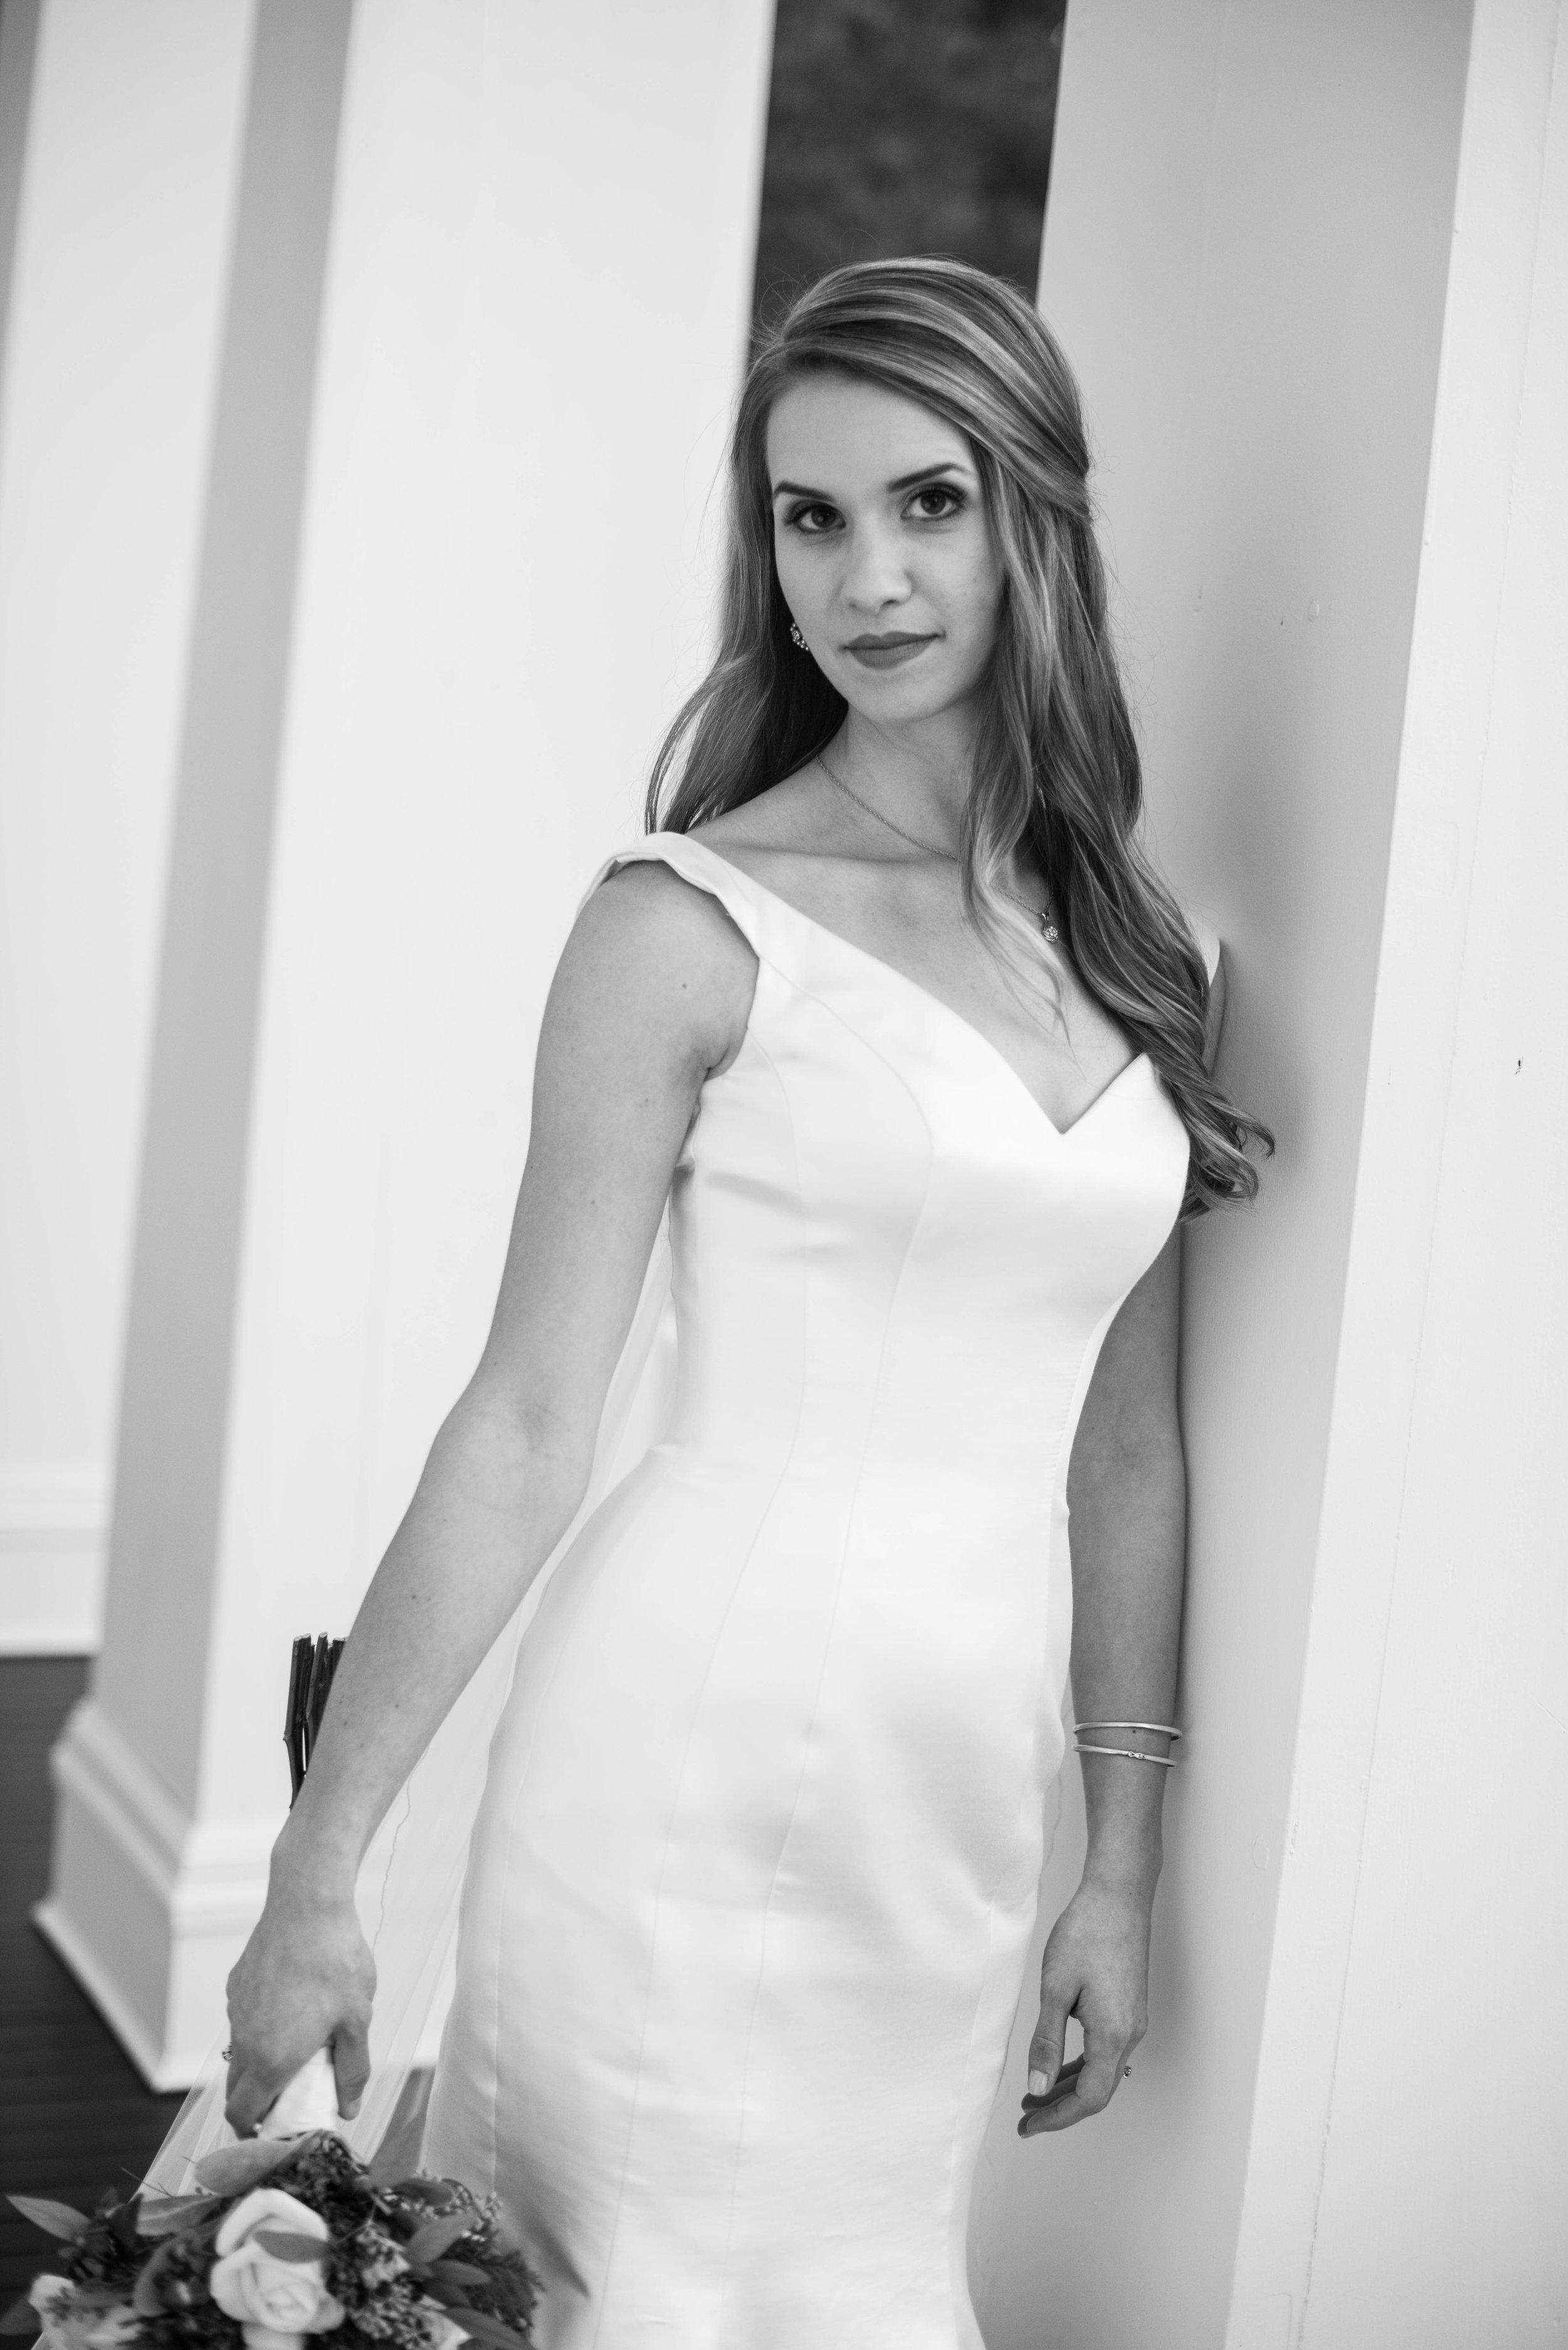 JuliaWilliams|Bridals|ZBW_MiraPhotographs-85.jpg